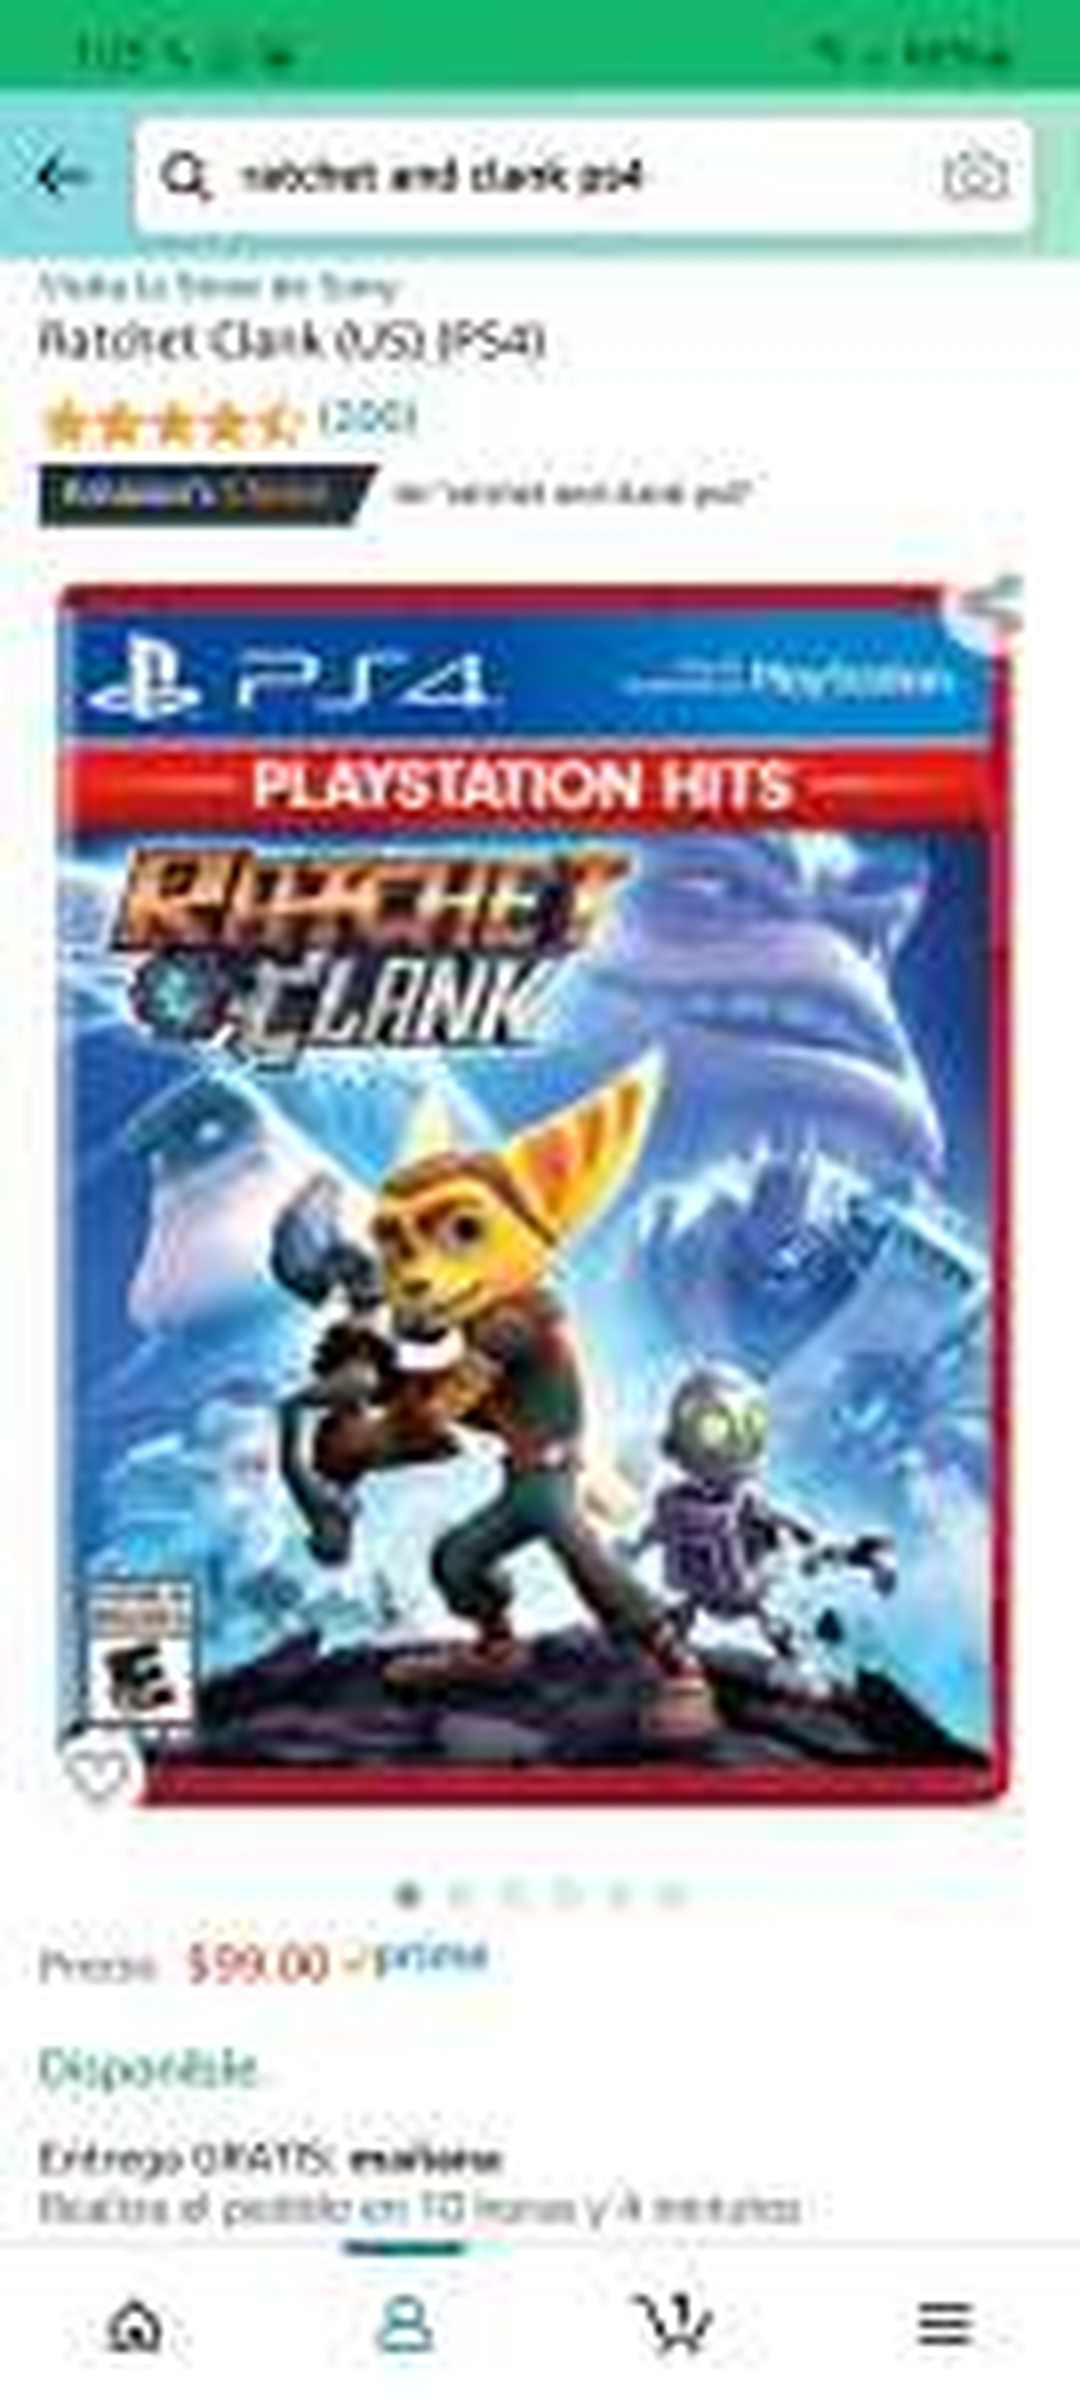 Amazon: Ratchet and clanck PS4 $99